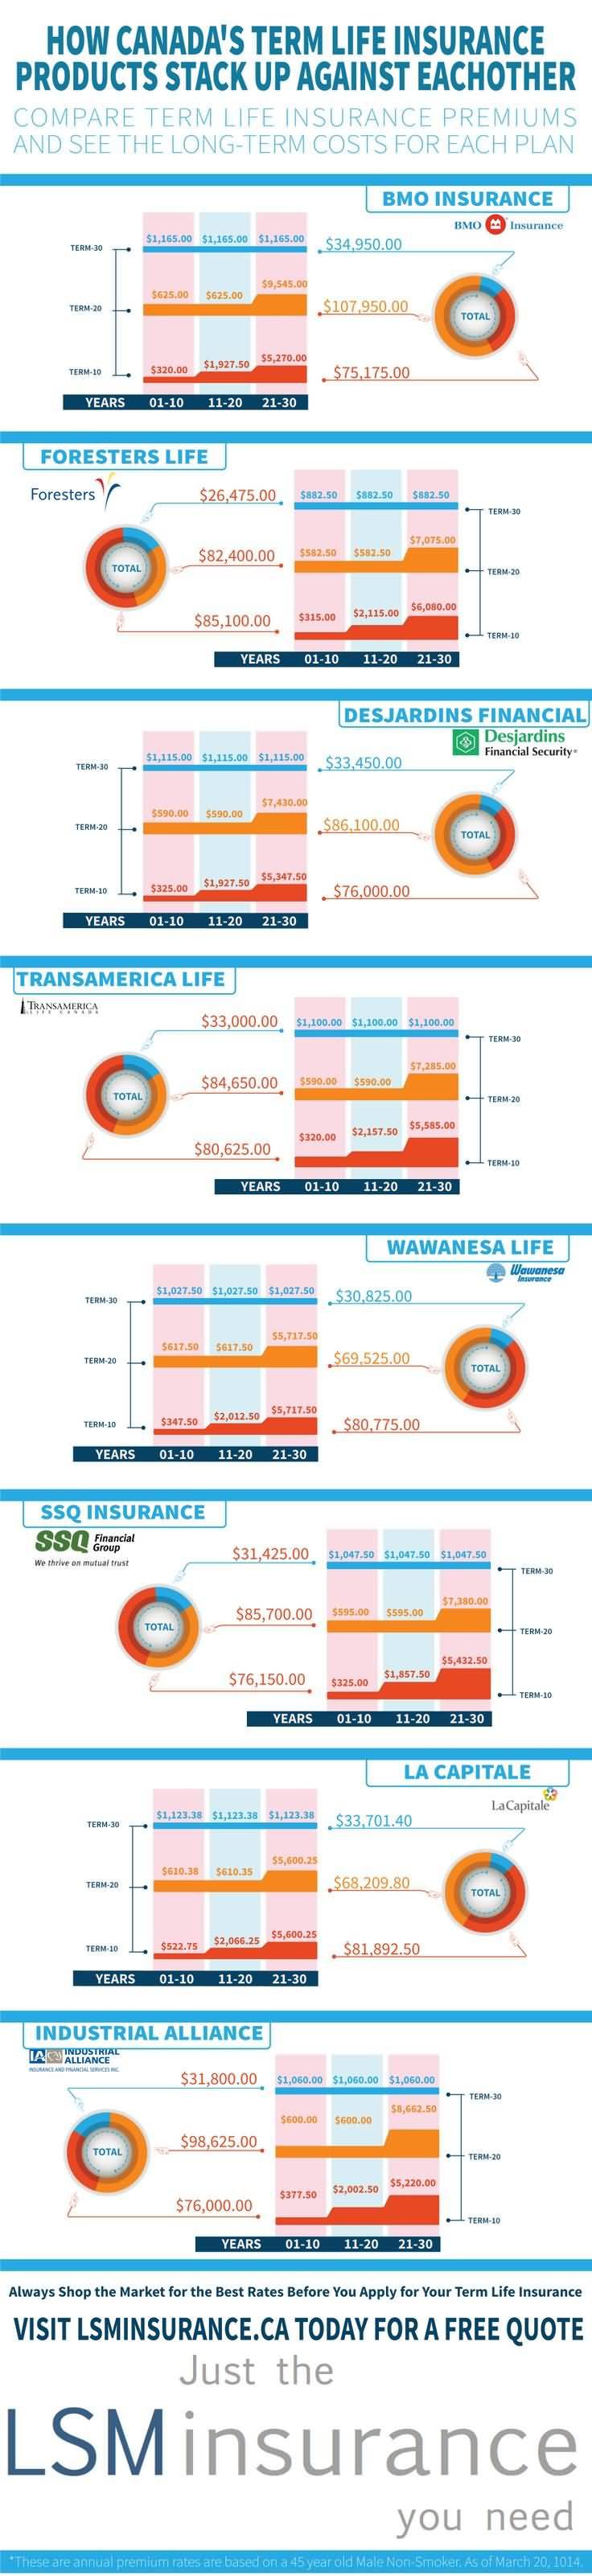 Bmo Term Life Insurance Quote 08